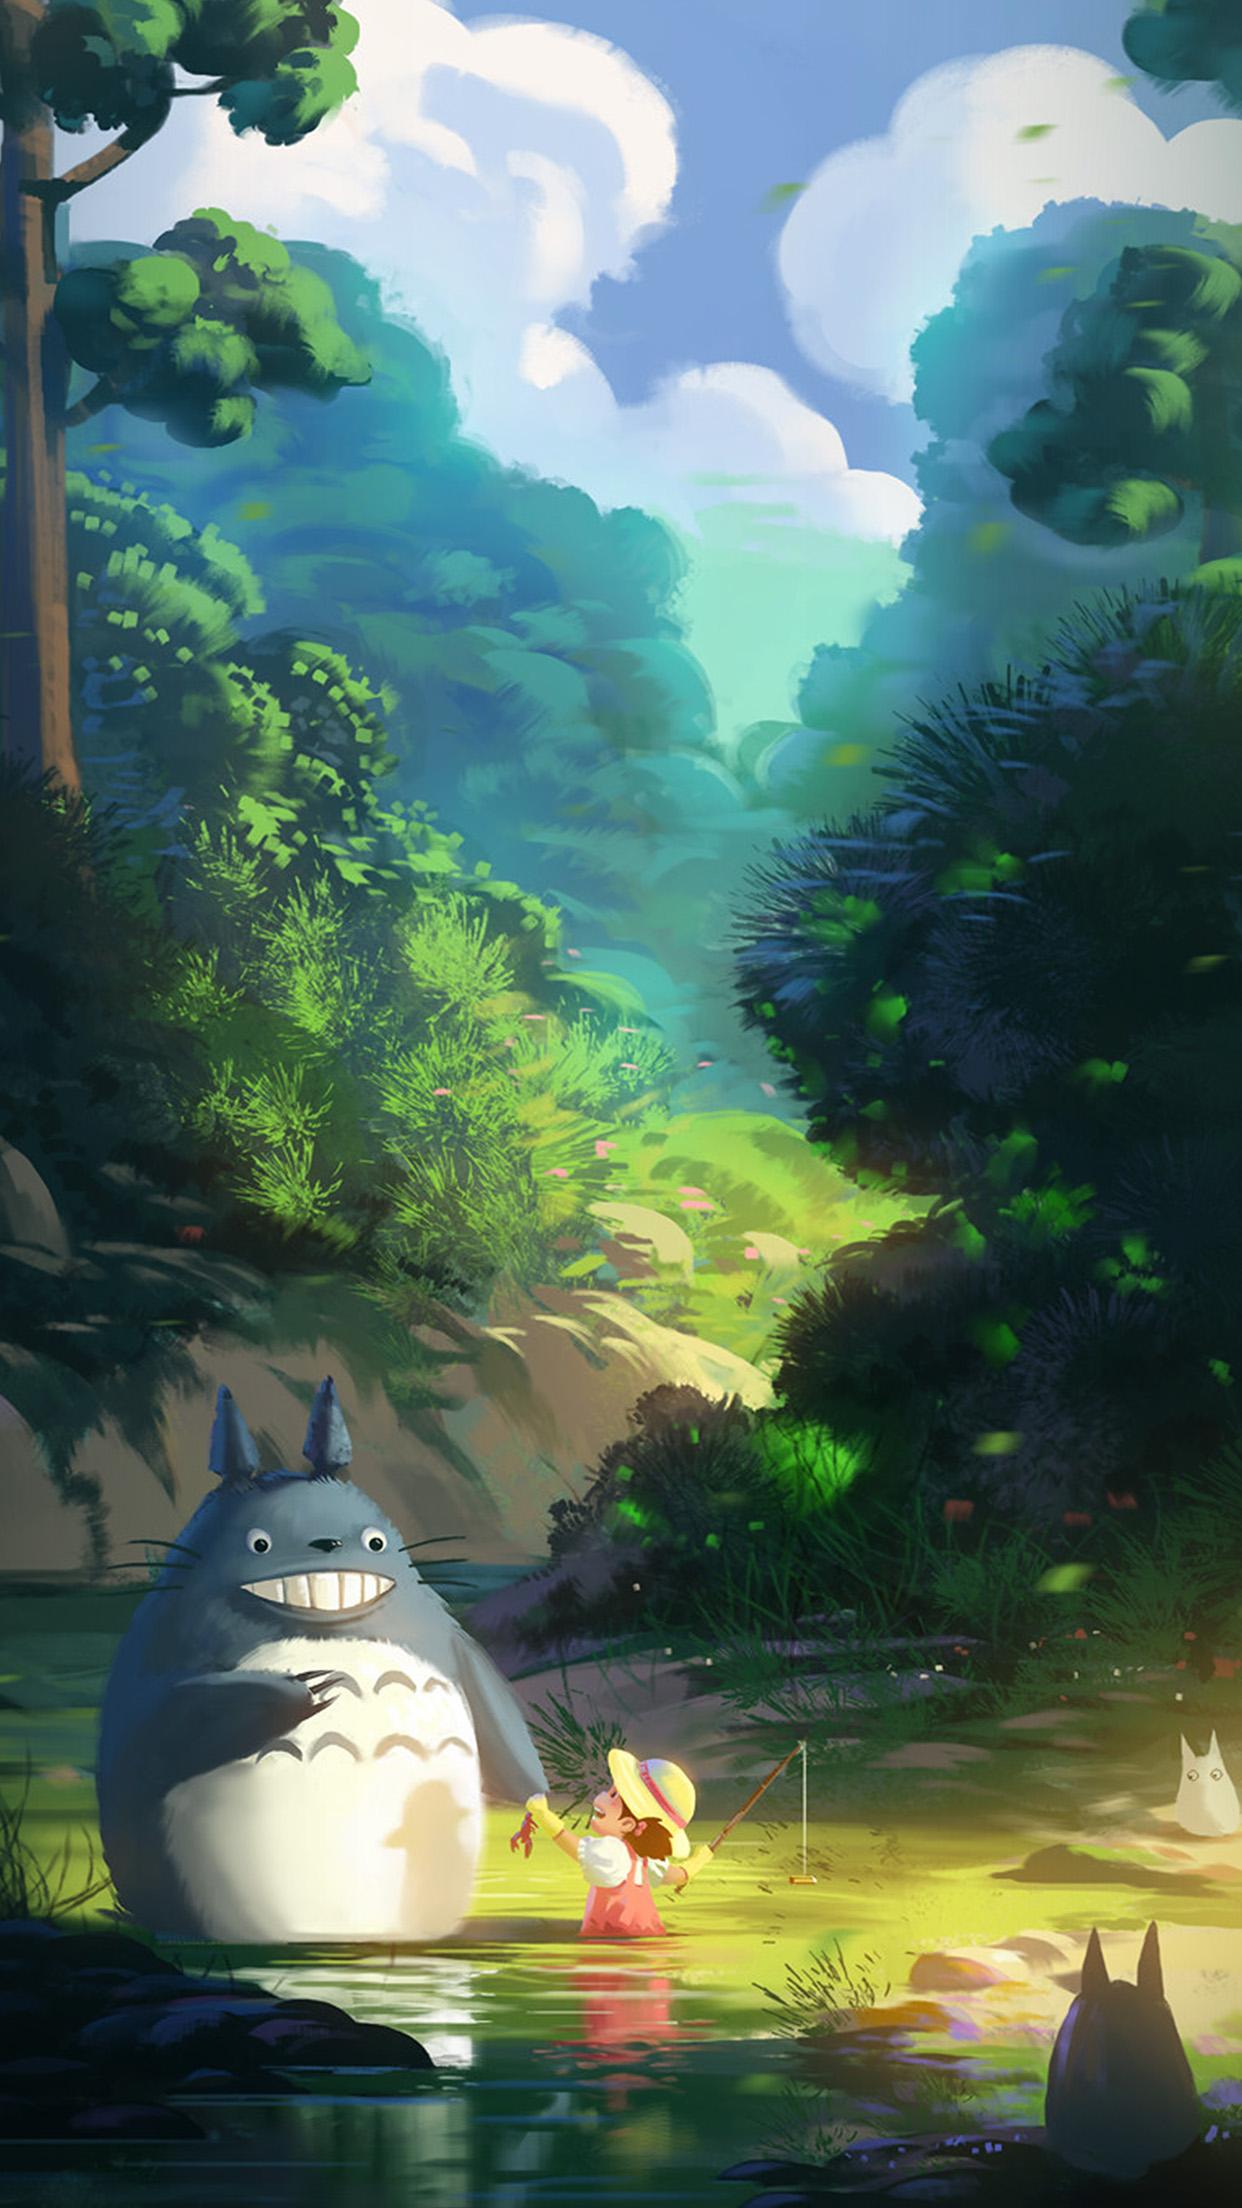 Av33 Totoro Anime Liang Xing Illustration Art